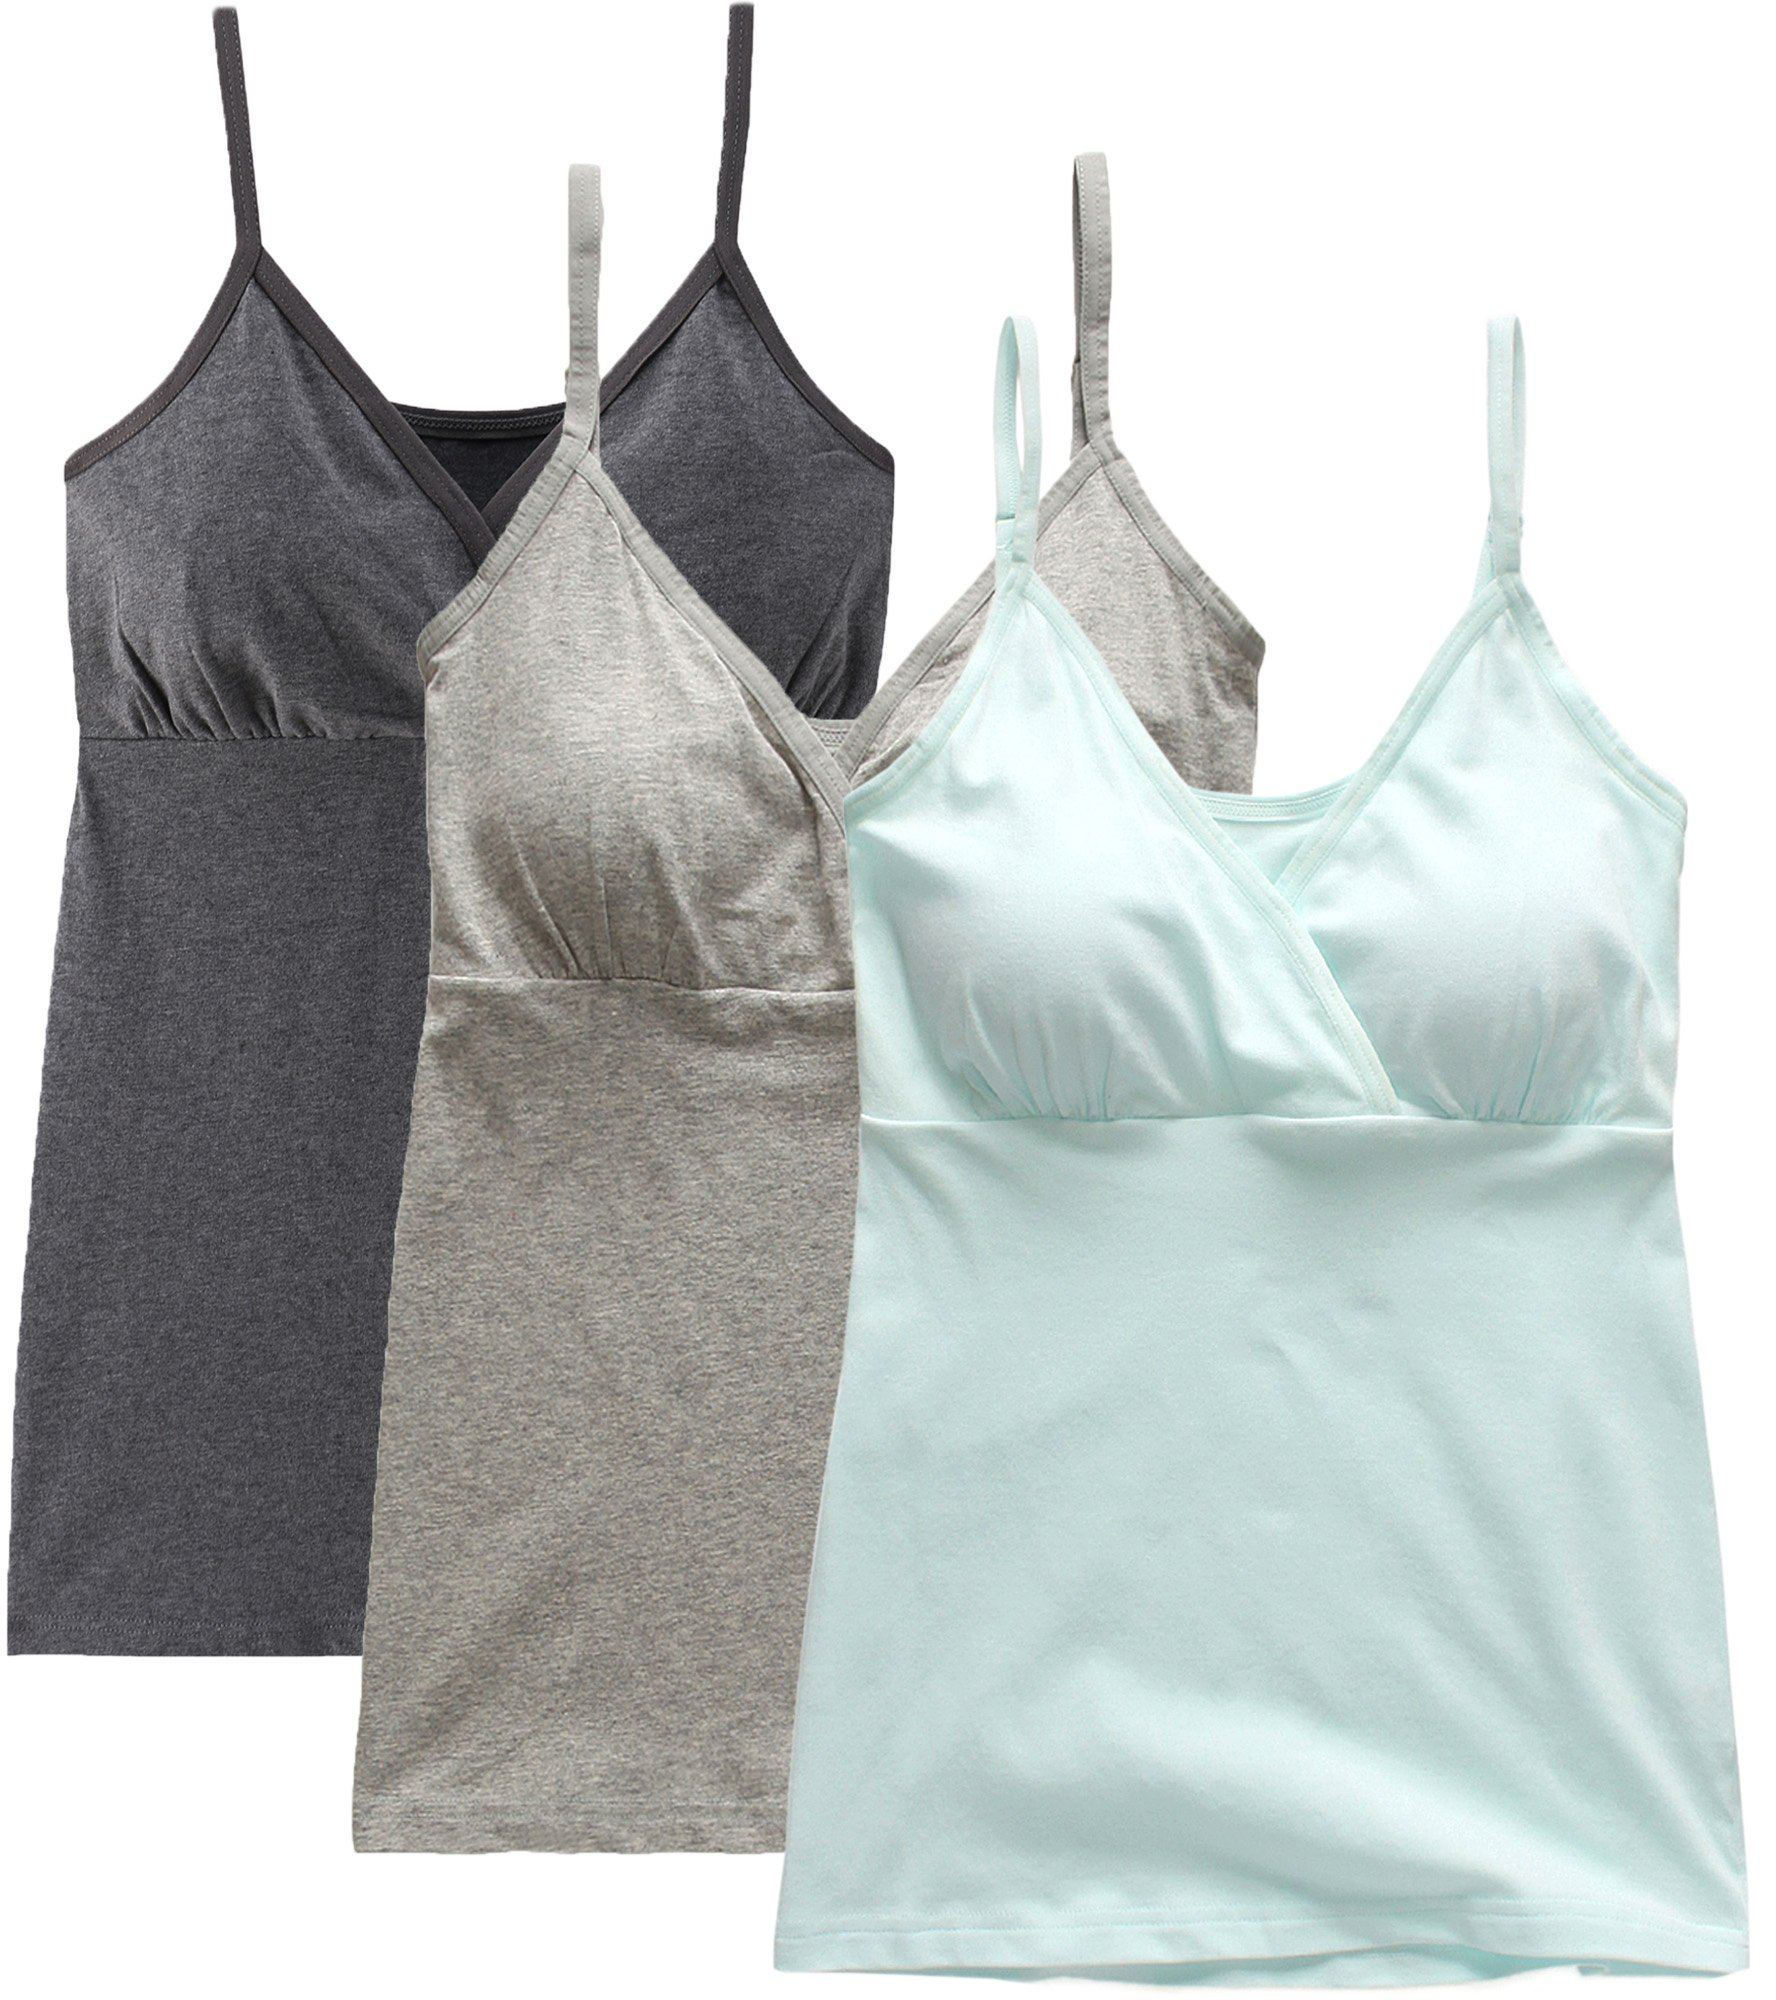 Nursing Tank Tops, Maternity Nursing Bras Camisole Pajamas For Breastfeeding (Large: Fits for Weight 150-170 lb, Dark Grey+Grey+Light Blue (3Pcs)) by SUIEK